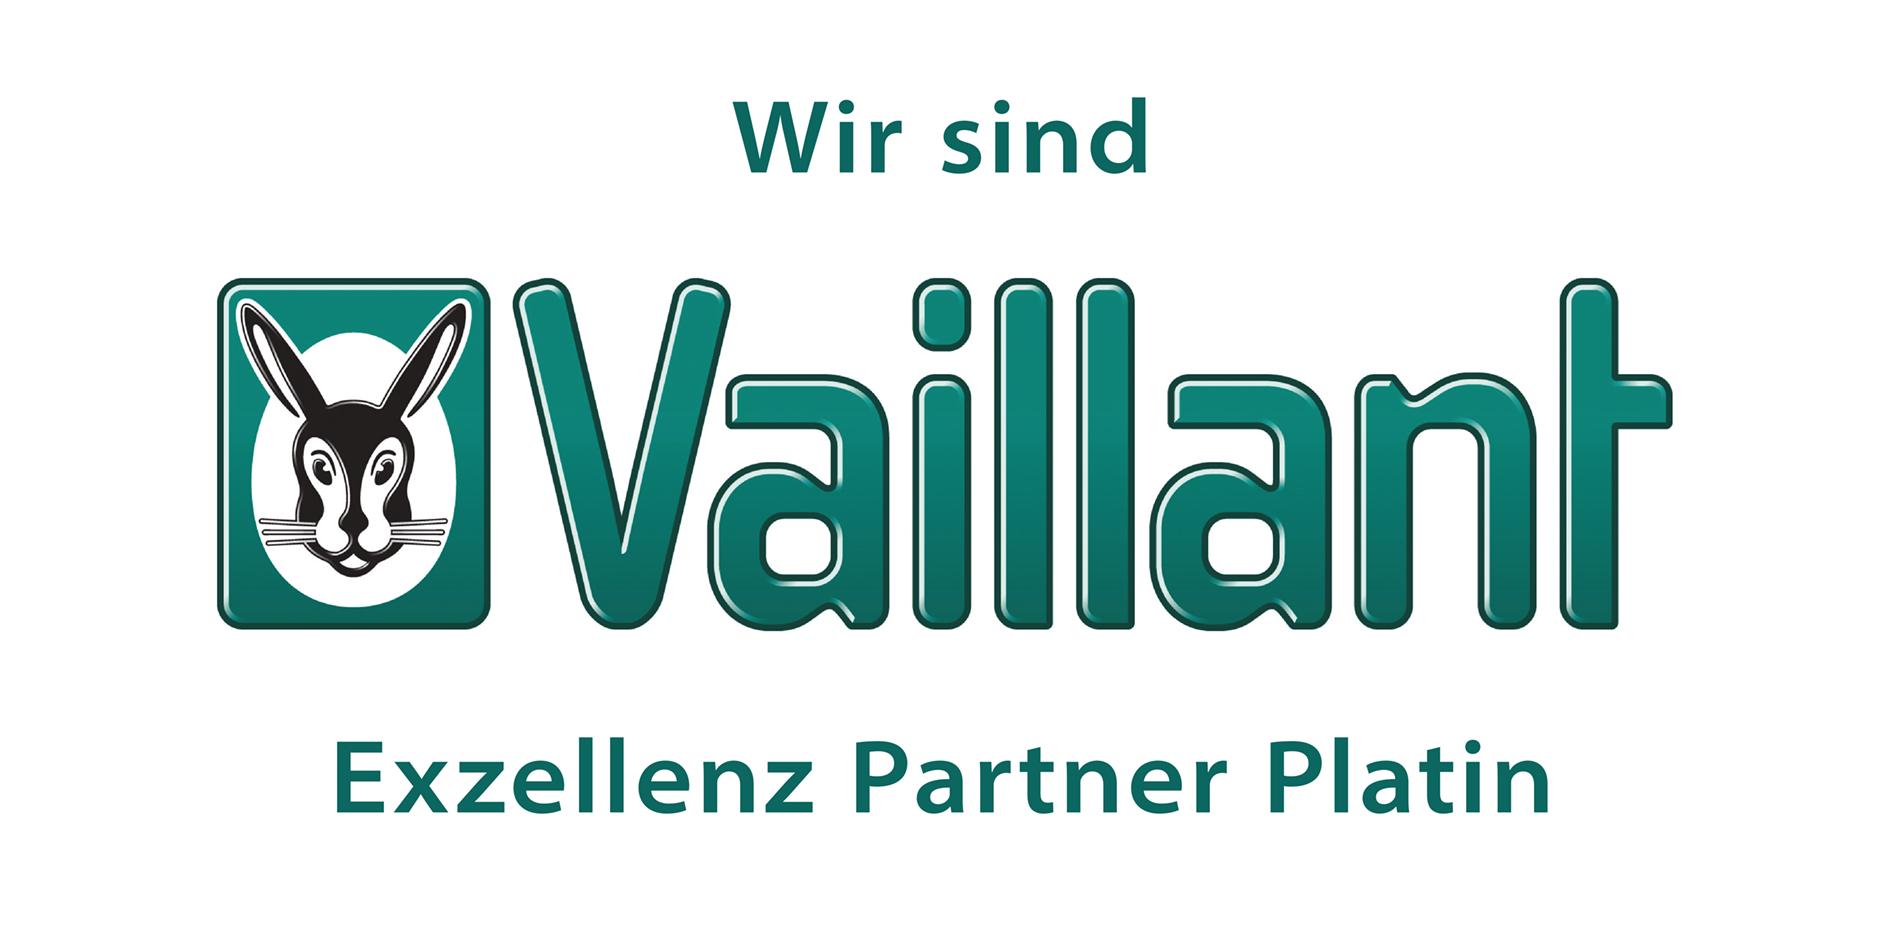 Vaillant Exzellenzpartner Platin-Logo